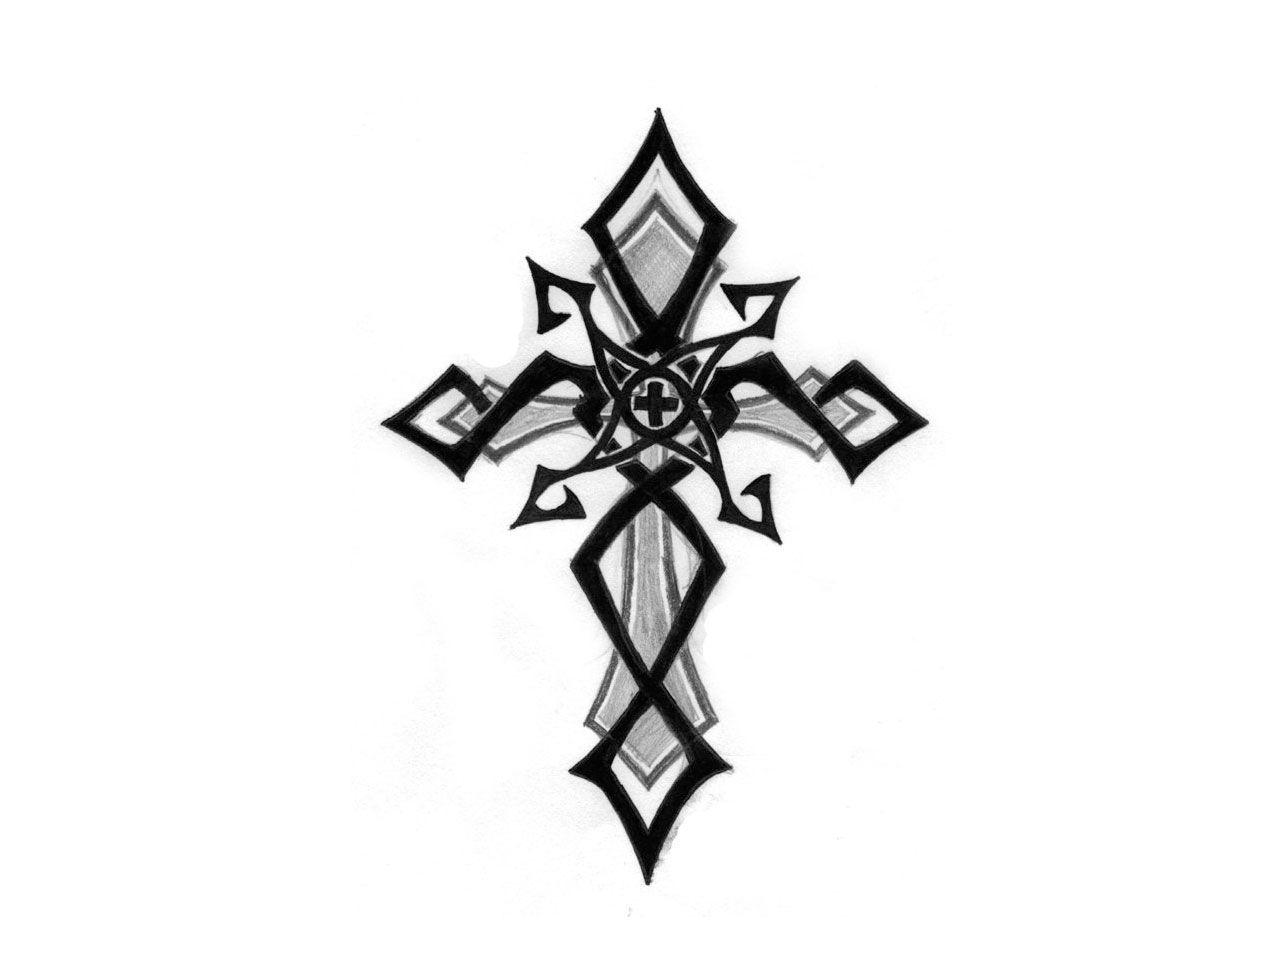 Small Tribal Tattoos Free Designs